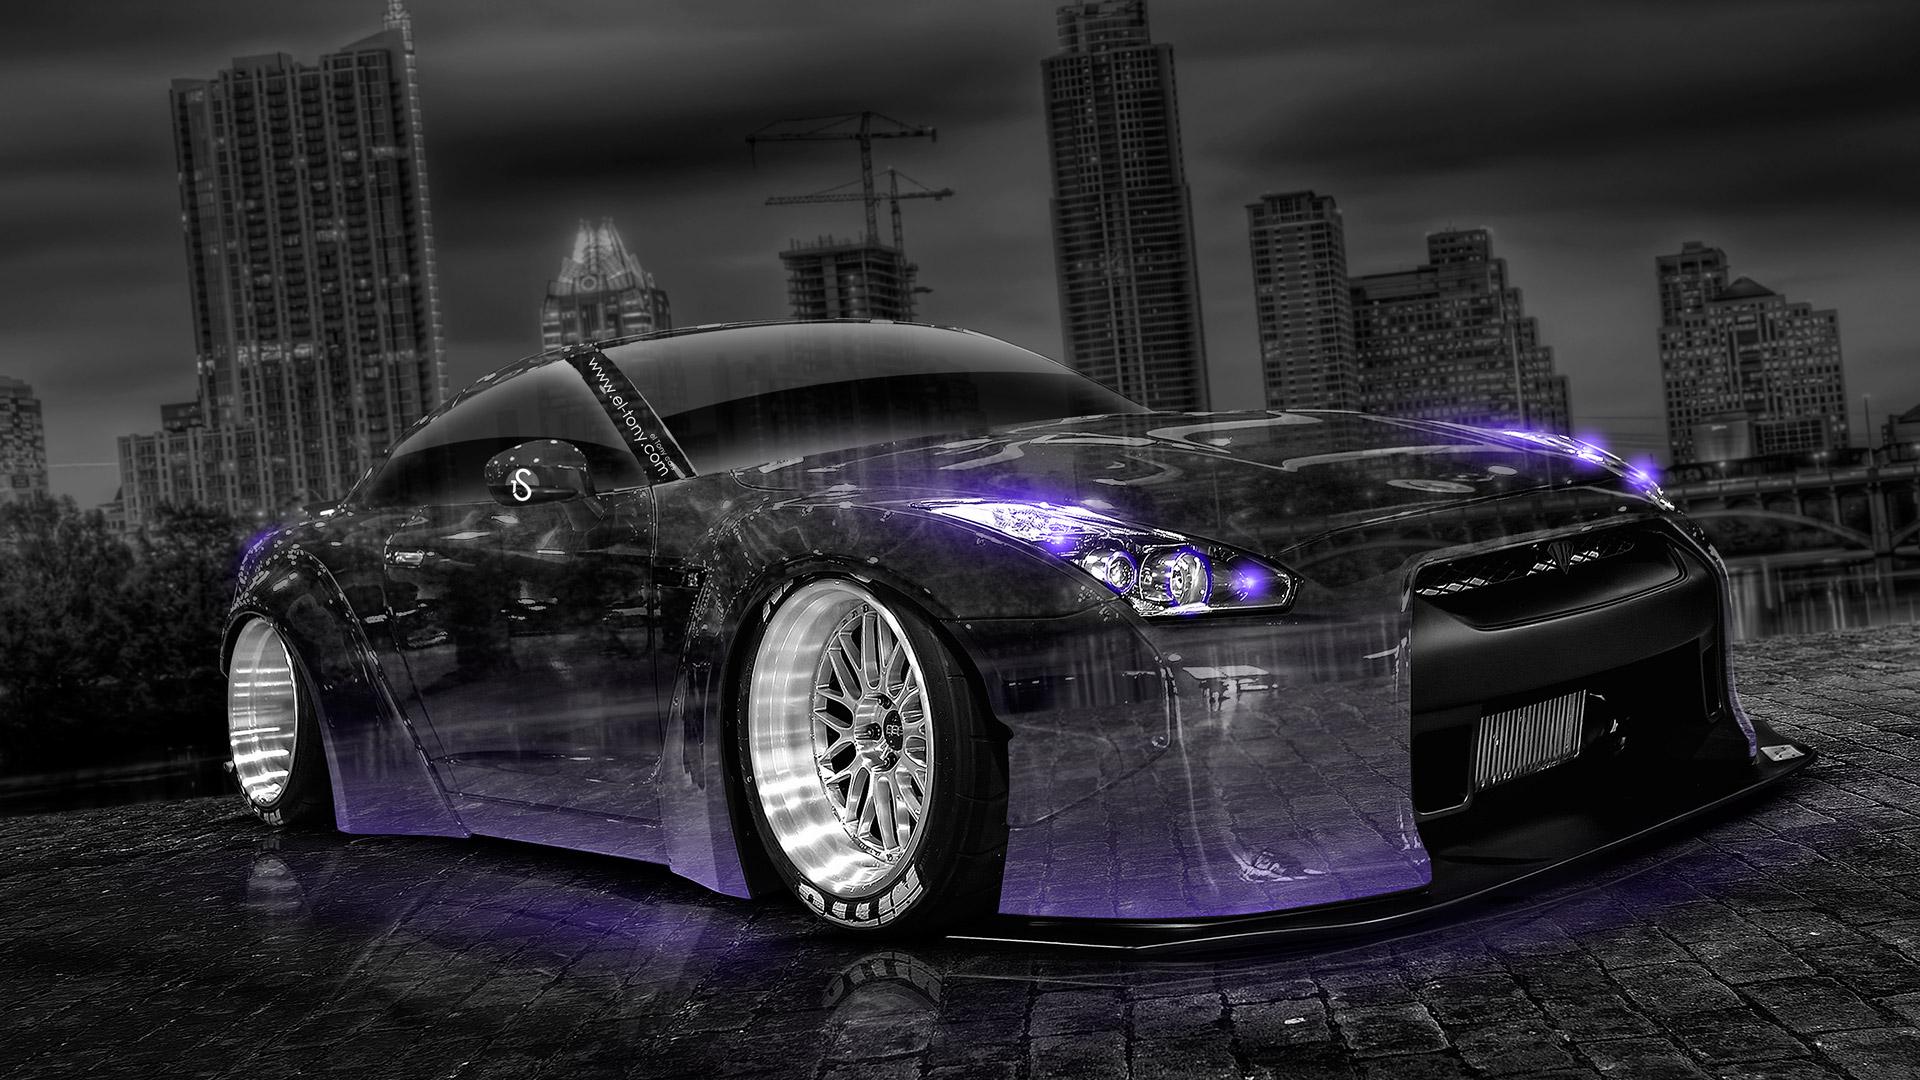 1920x1080 Nissan GTR R35 Tuning Crystal City Car 2014 | El Tony